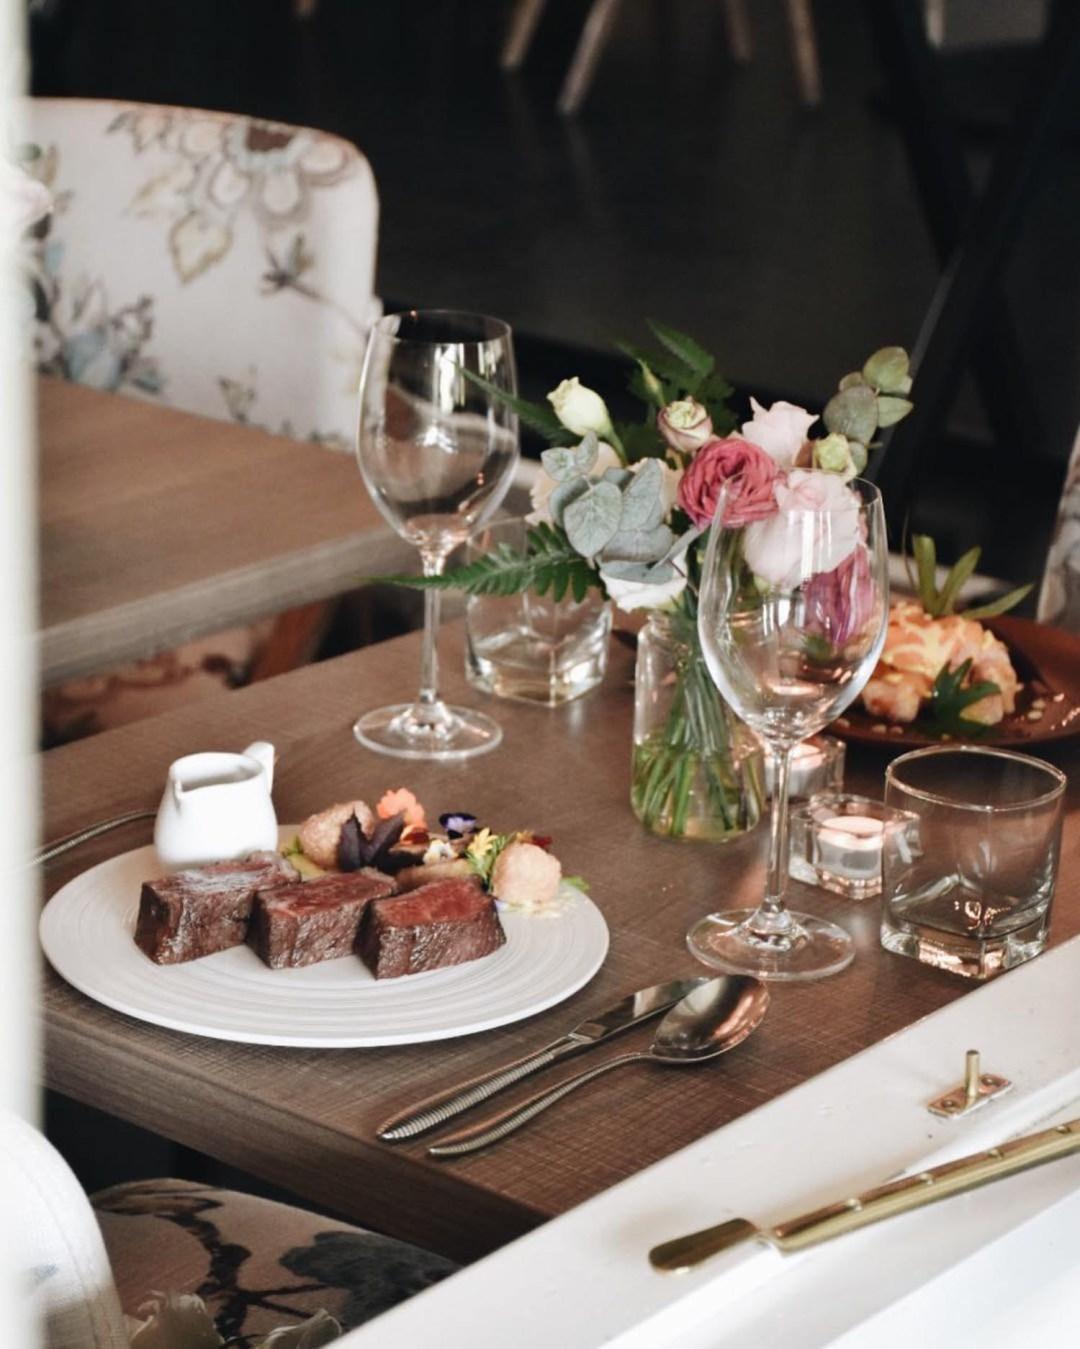 Romantic Restaurant - The Summerhouse Food